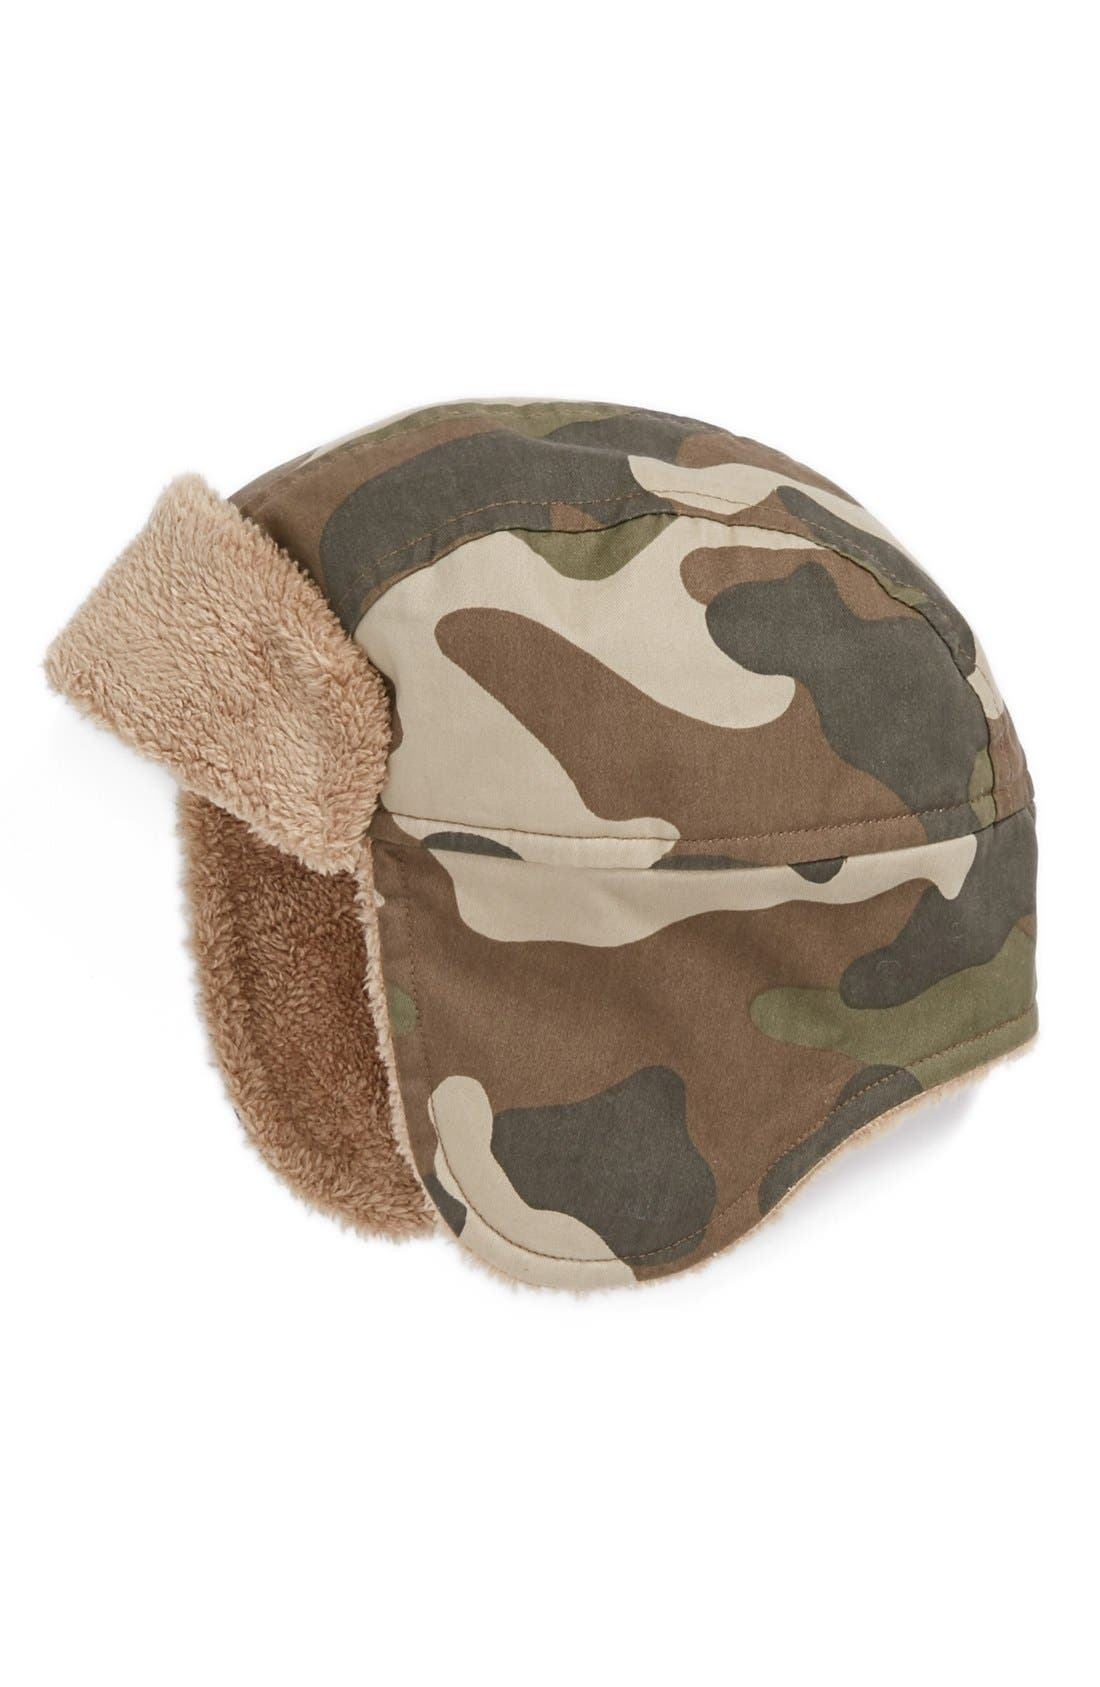 Alternate Image 1 Selected - Tucker + Tate Flight Hat (Toddler Boys)